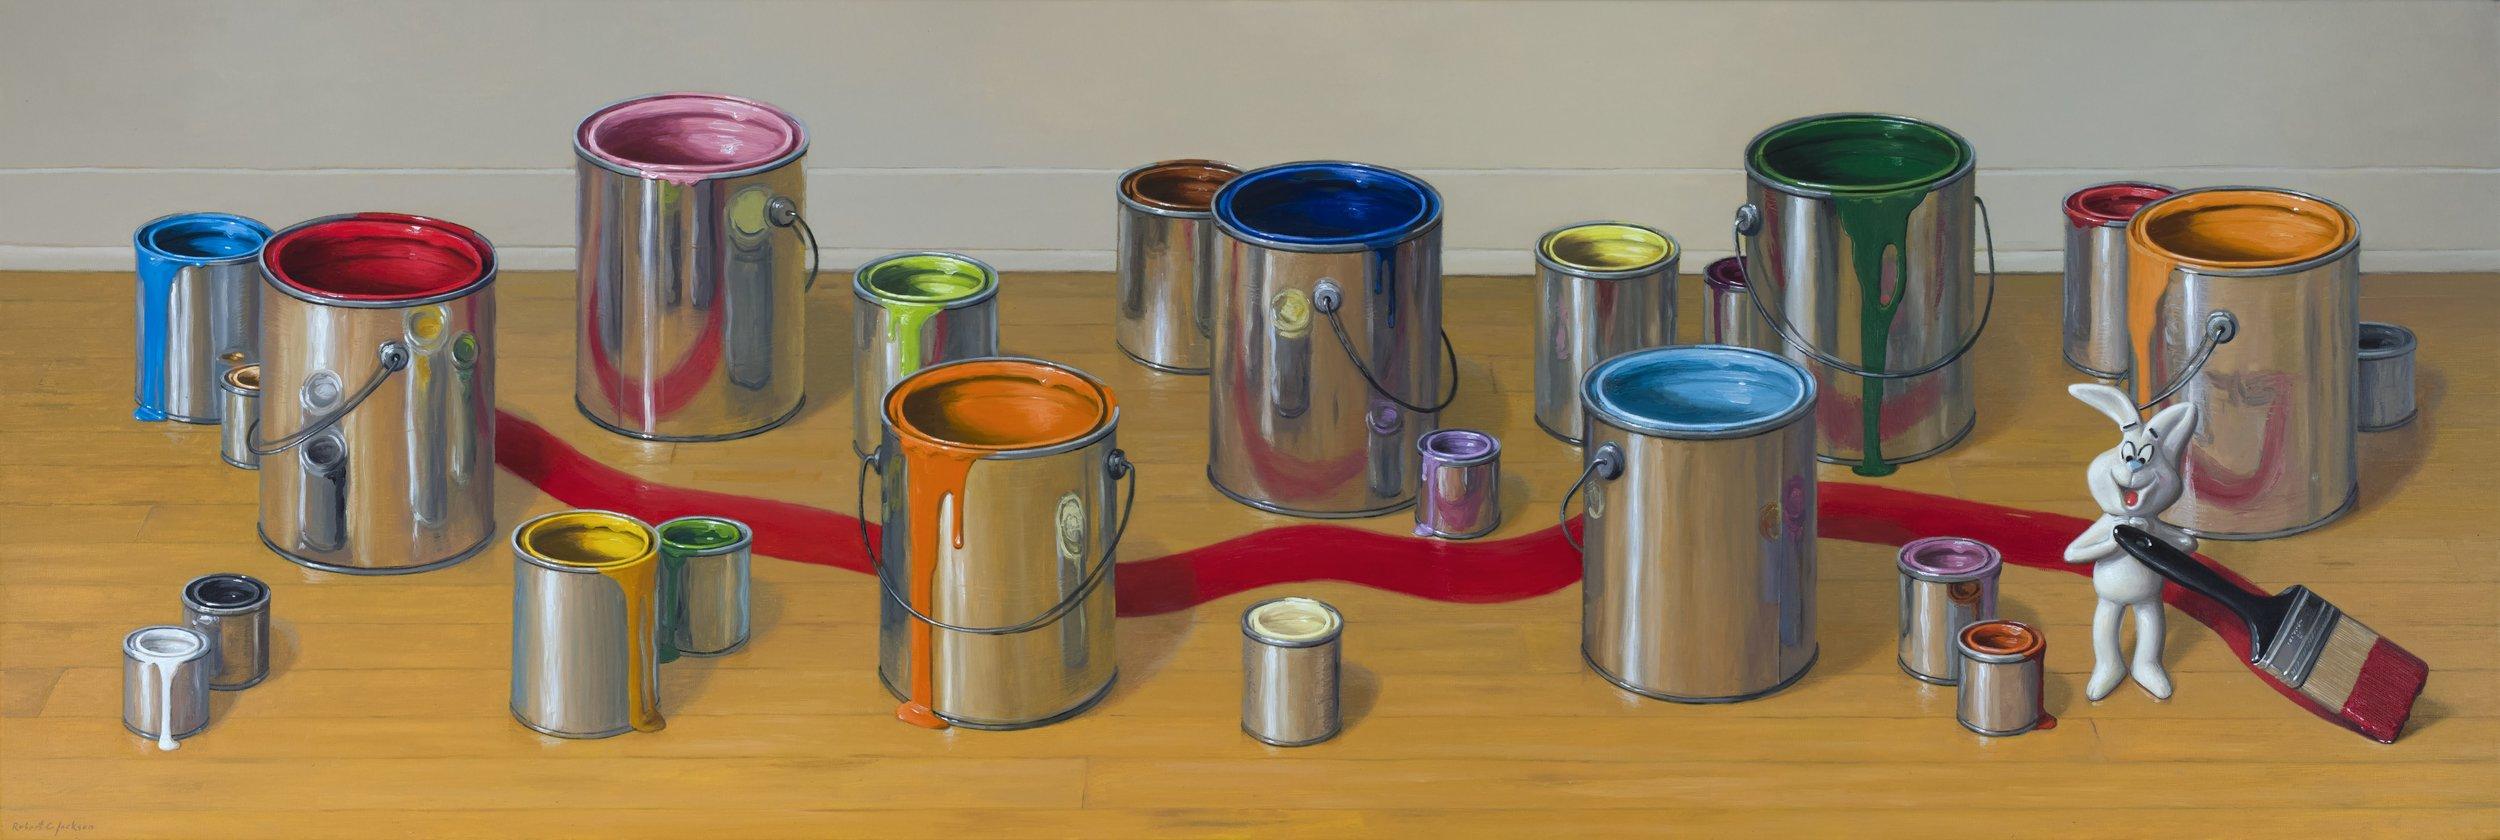 "The Artist, Oil on Linen 24"" x 72"""